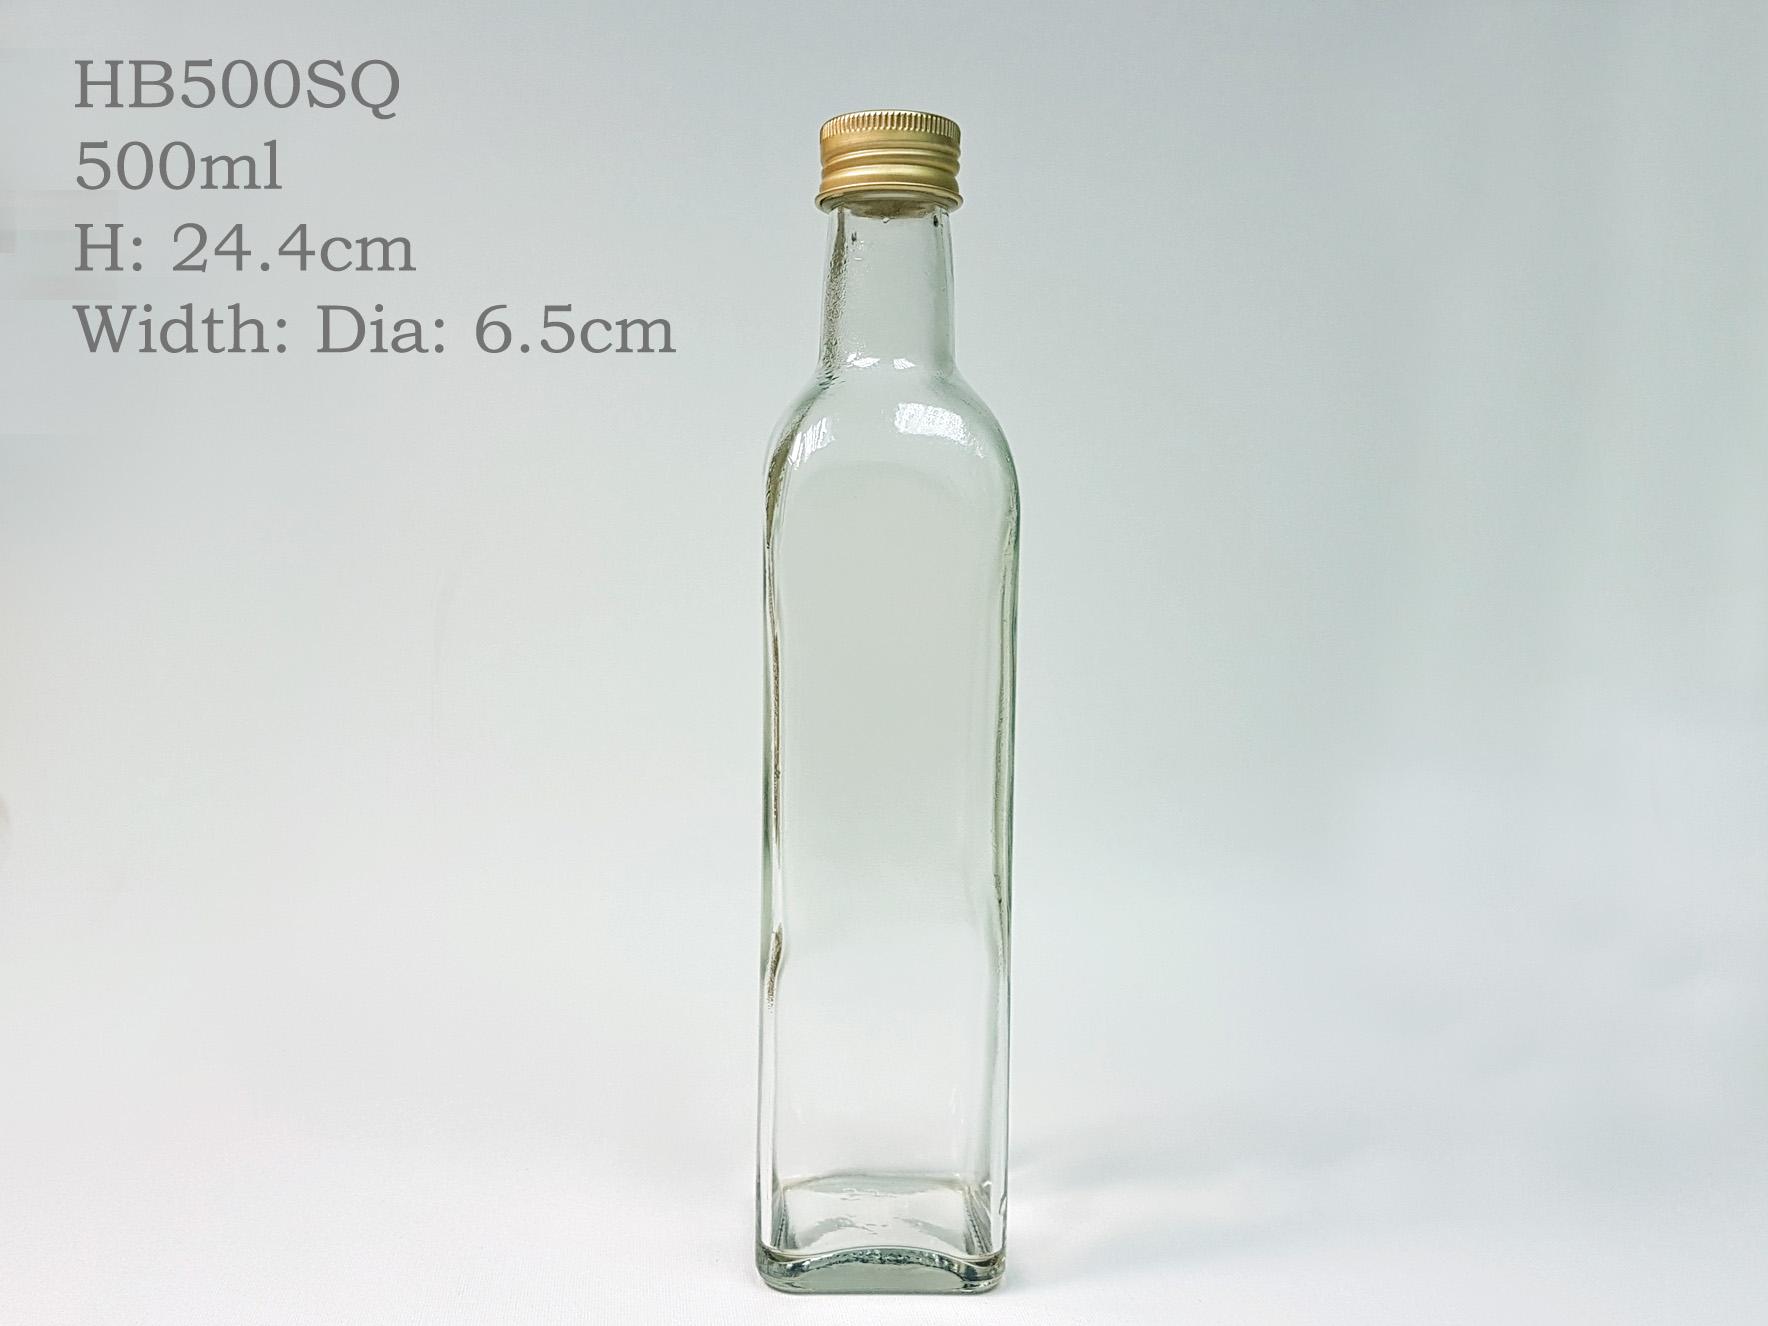 hb500sq